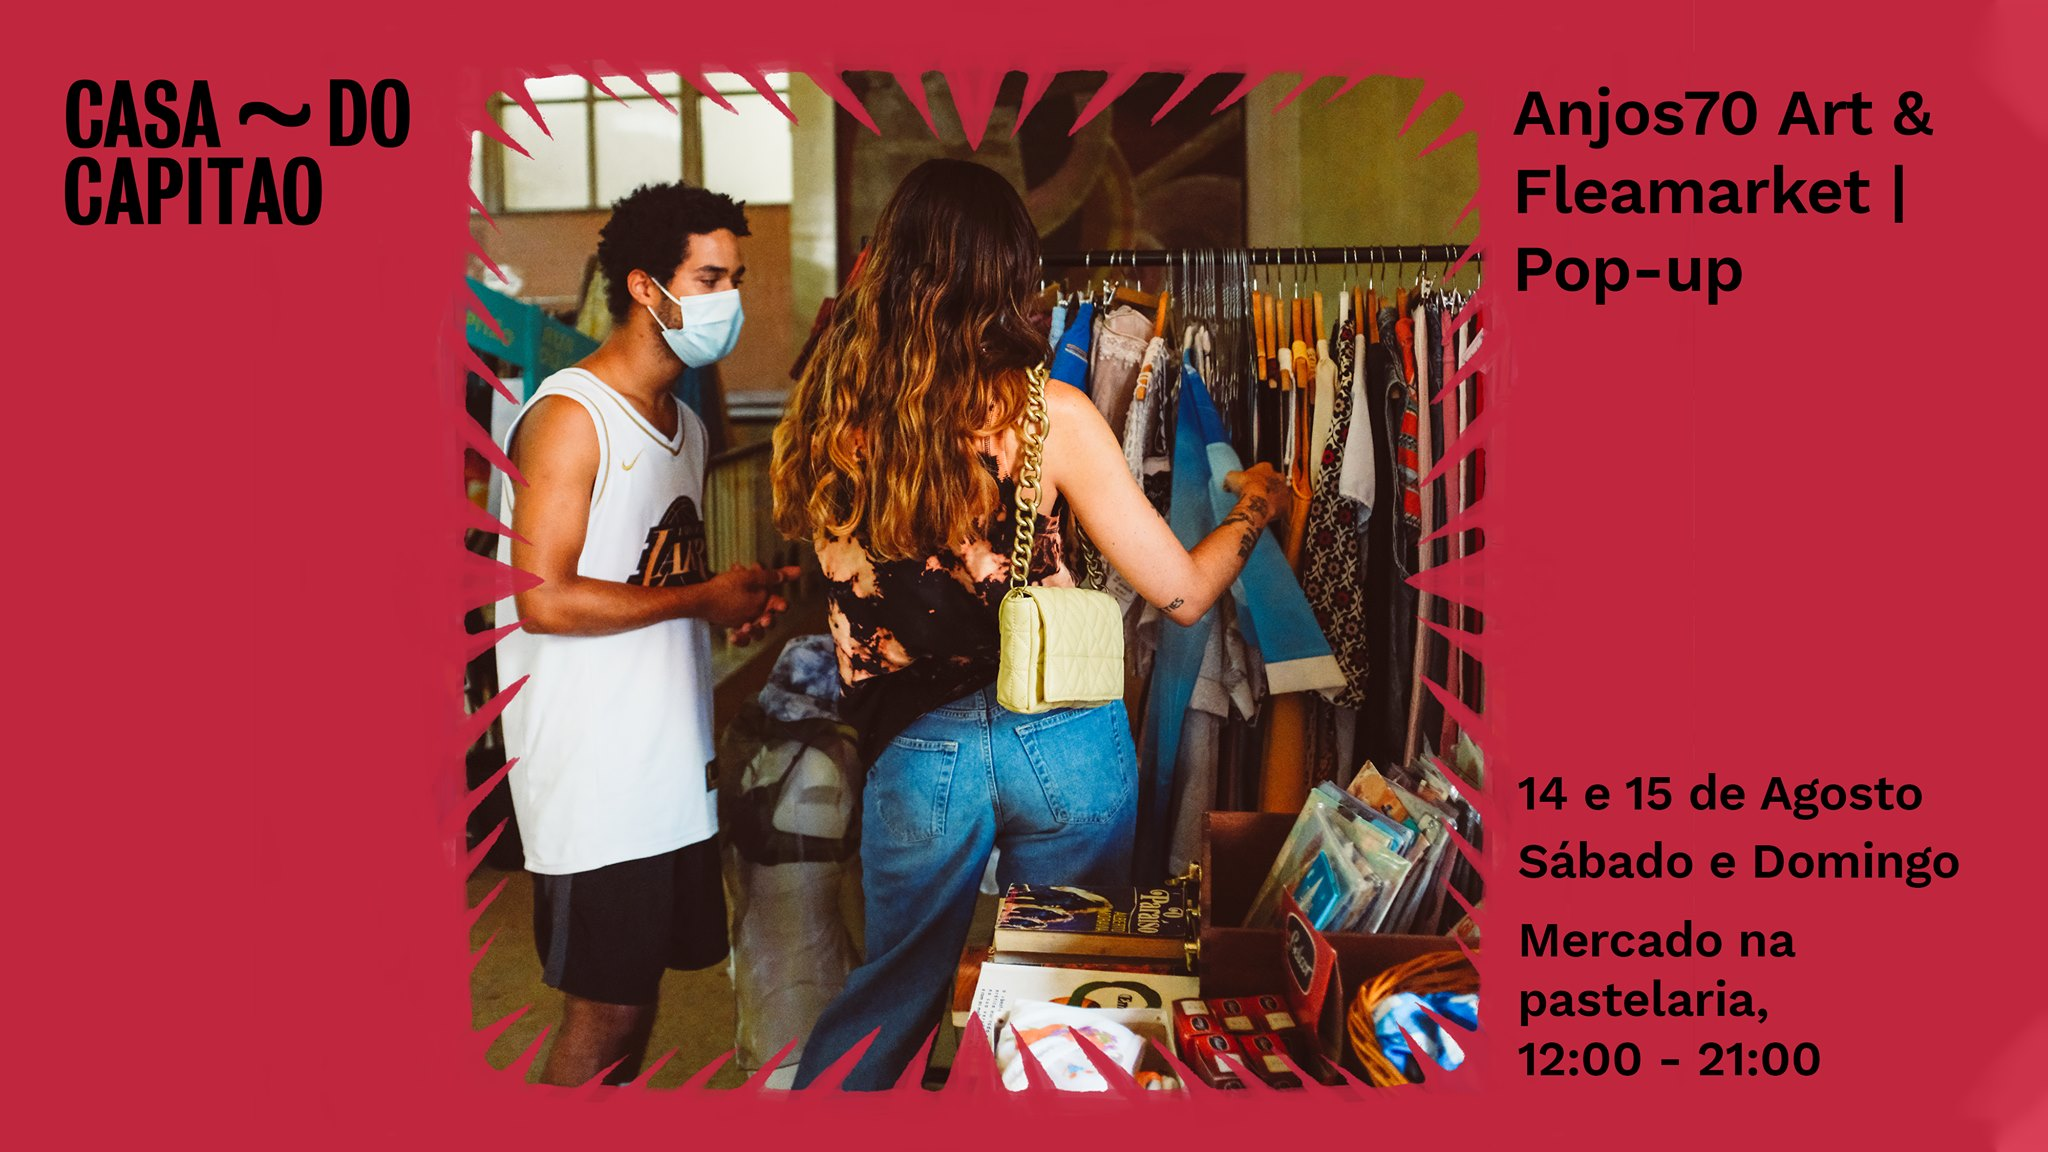 Anjos70 Art & Fleamarket | Pop-up • Mercado na pastelaria